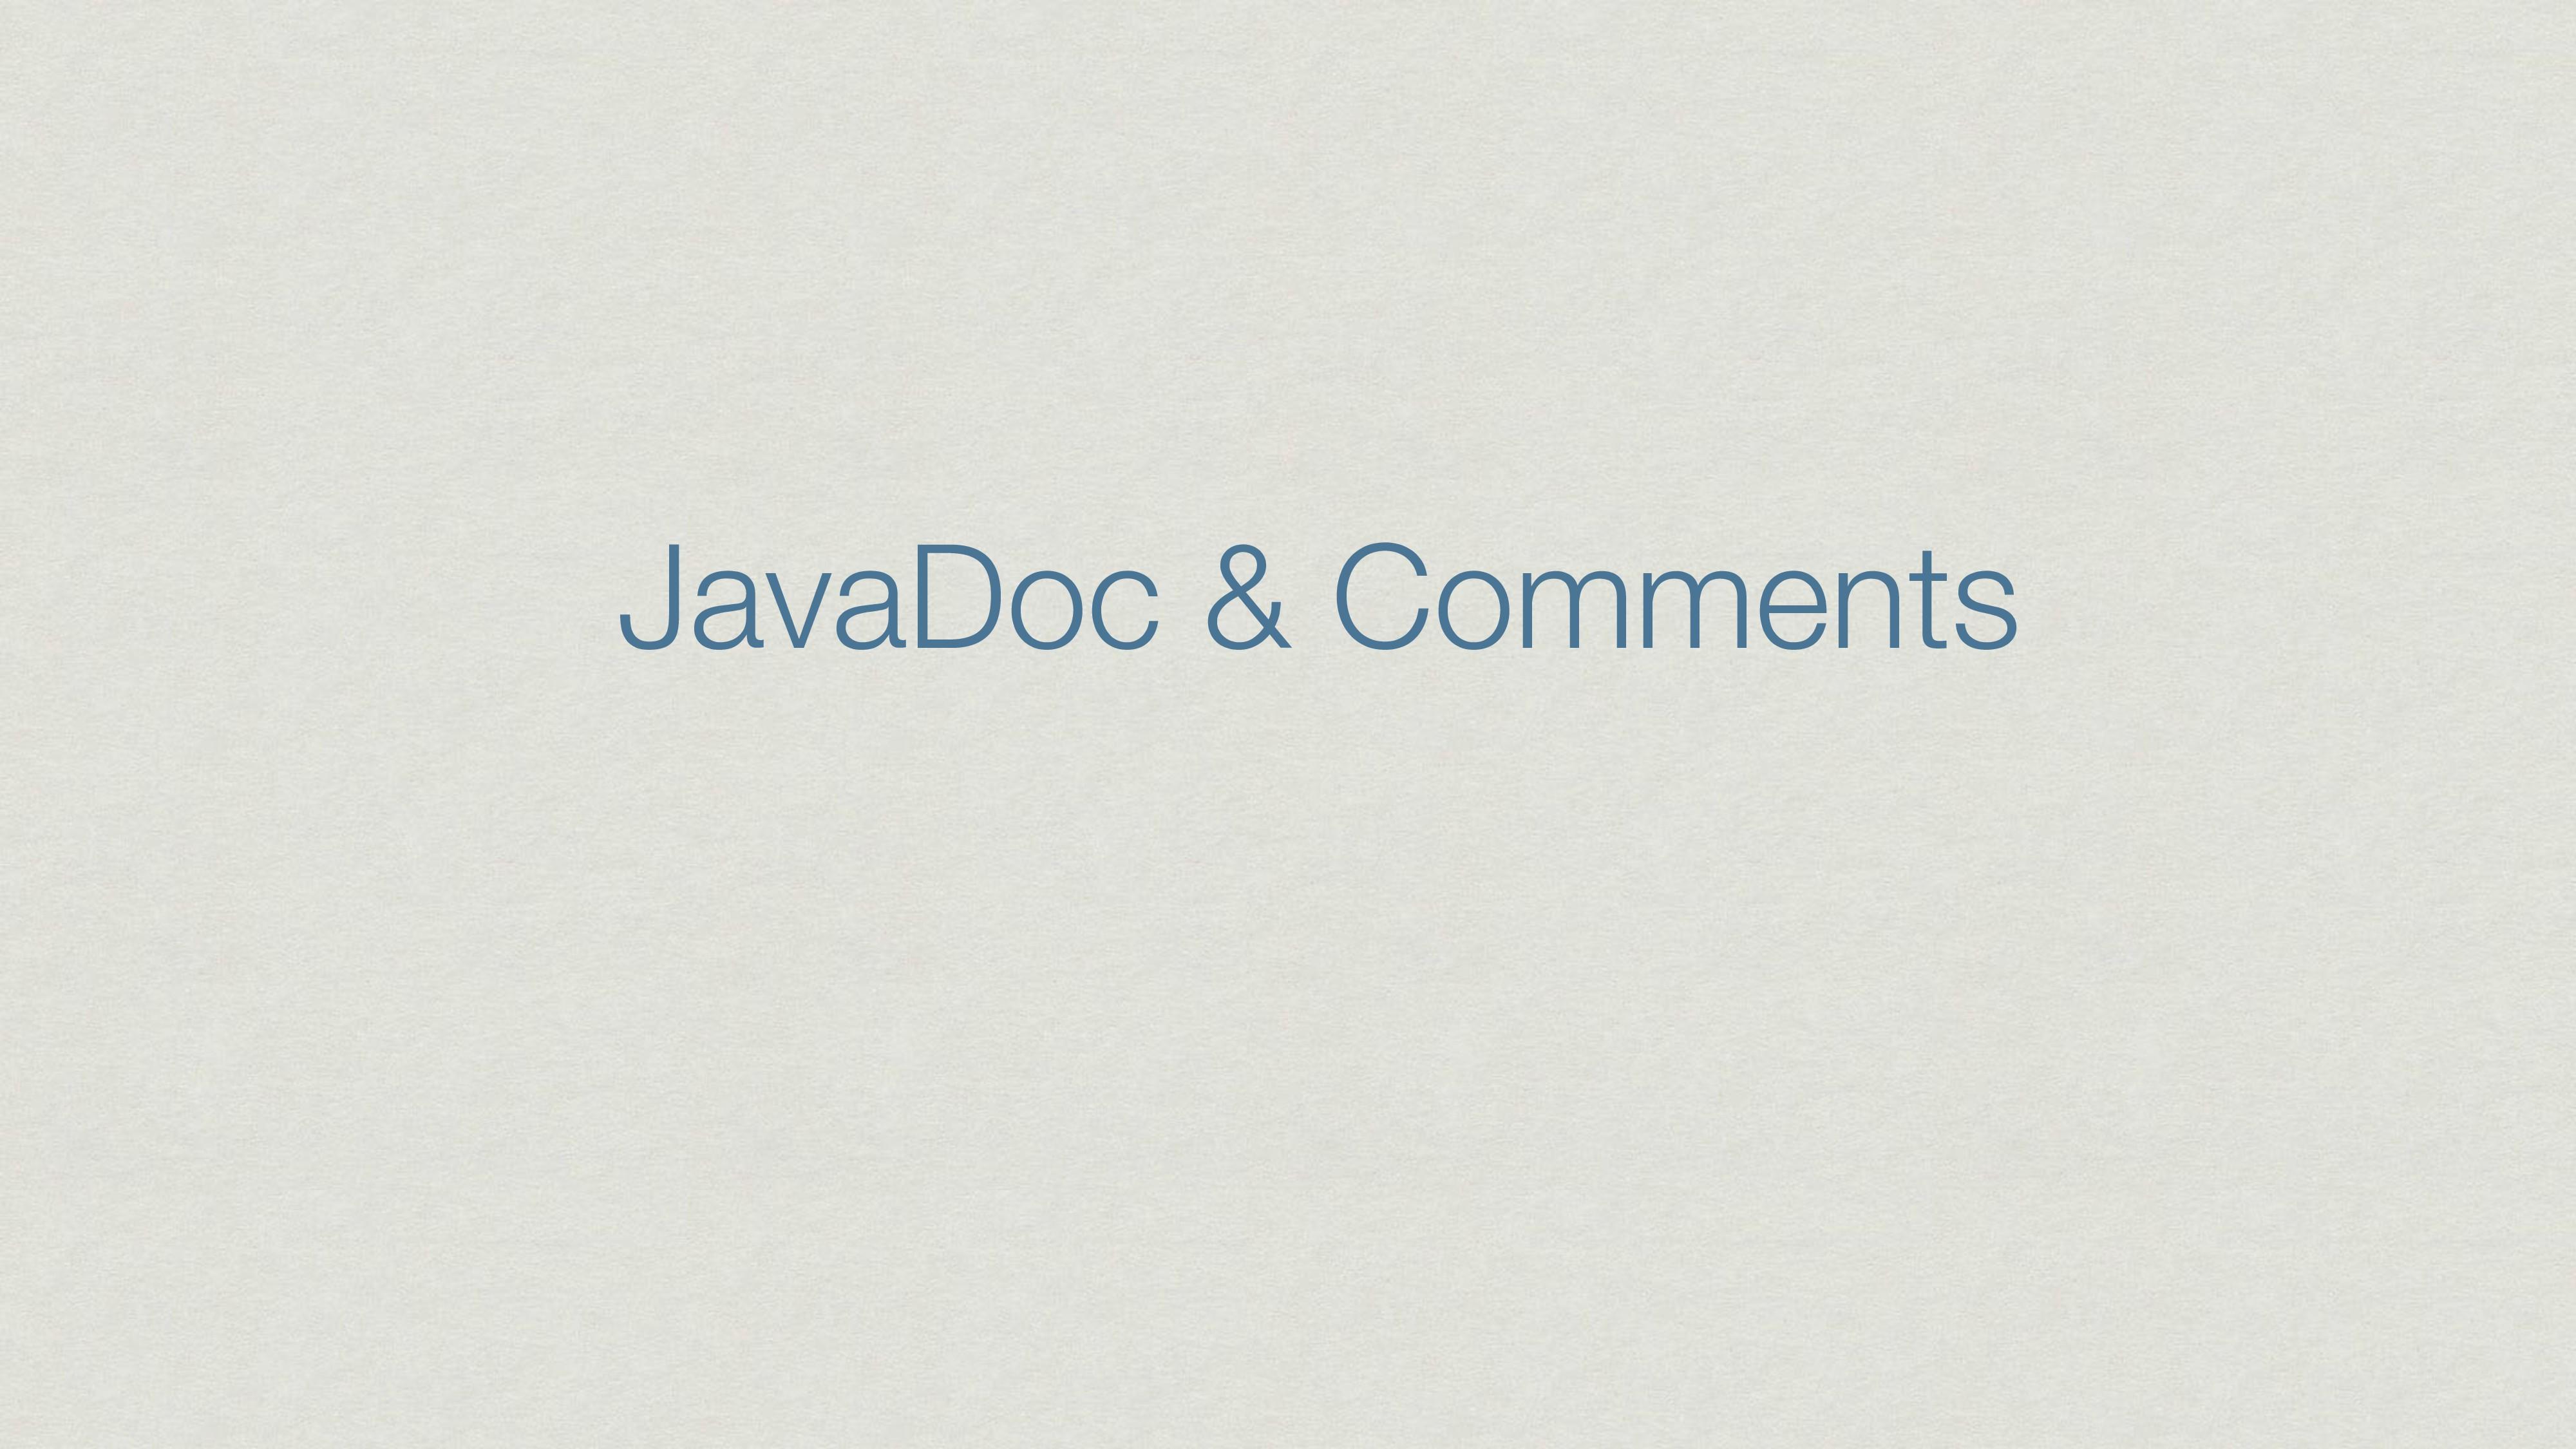 JavaDoc & Comments